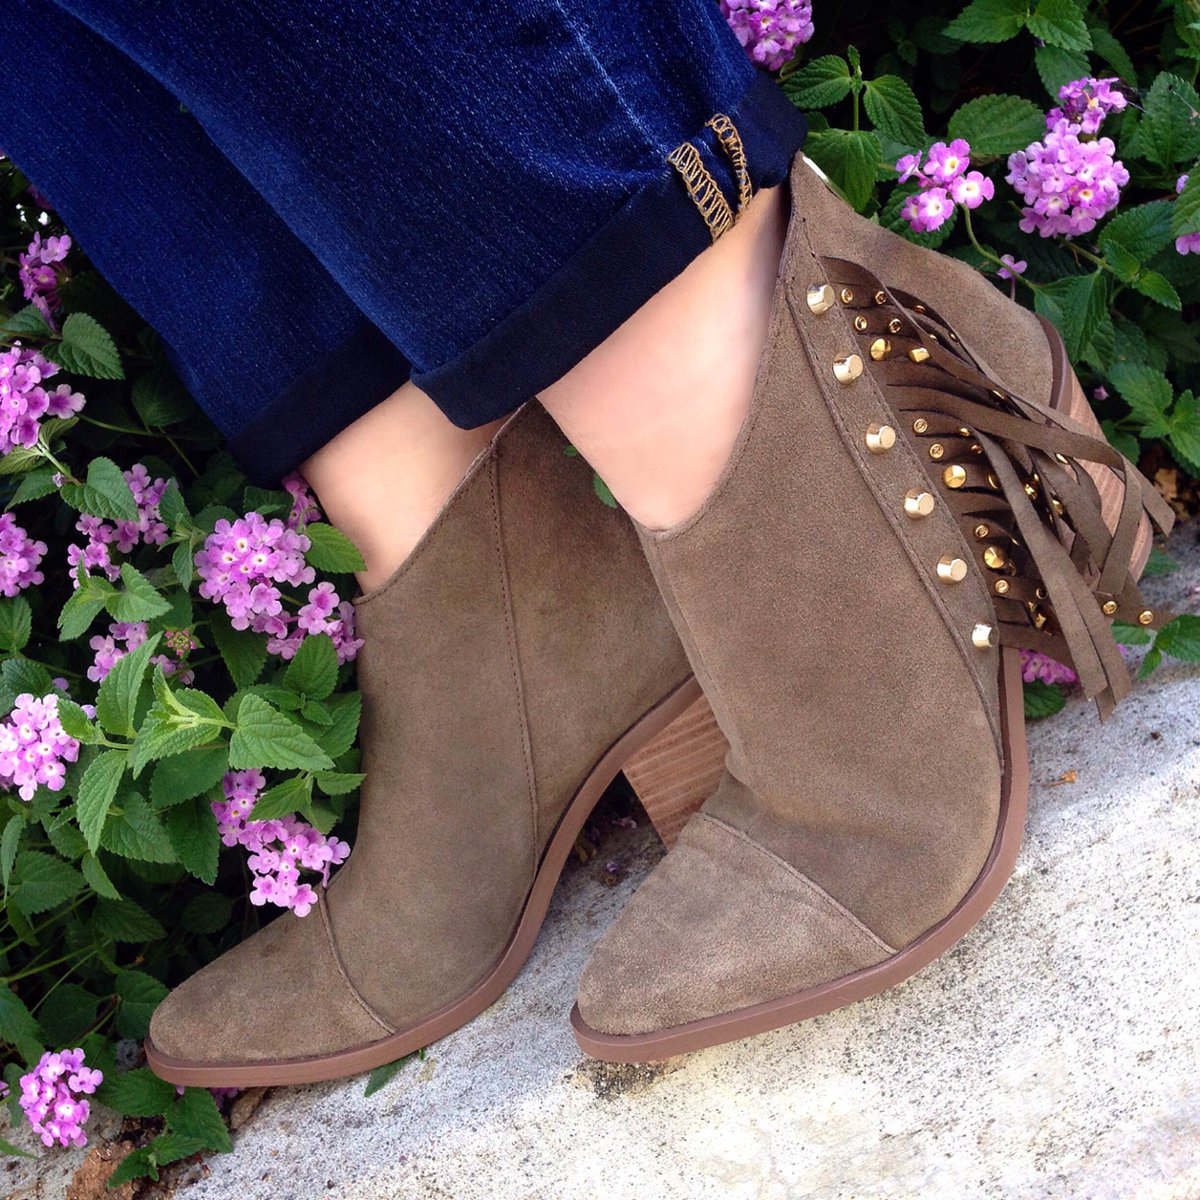 RT @FergieFootwear: #ShoeShopping is a #wisedecision w/ 20% OFF @Fergie BENNIE #boots thru 2/25!#WednesdayWisdom https://t.co/hpcNIW5kb9 ht…